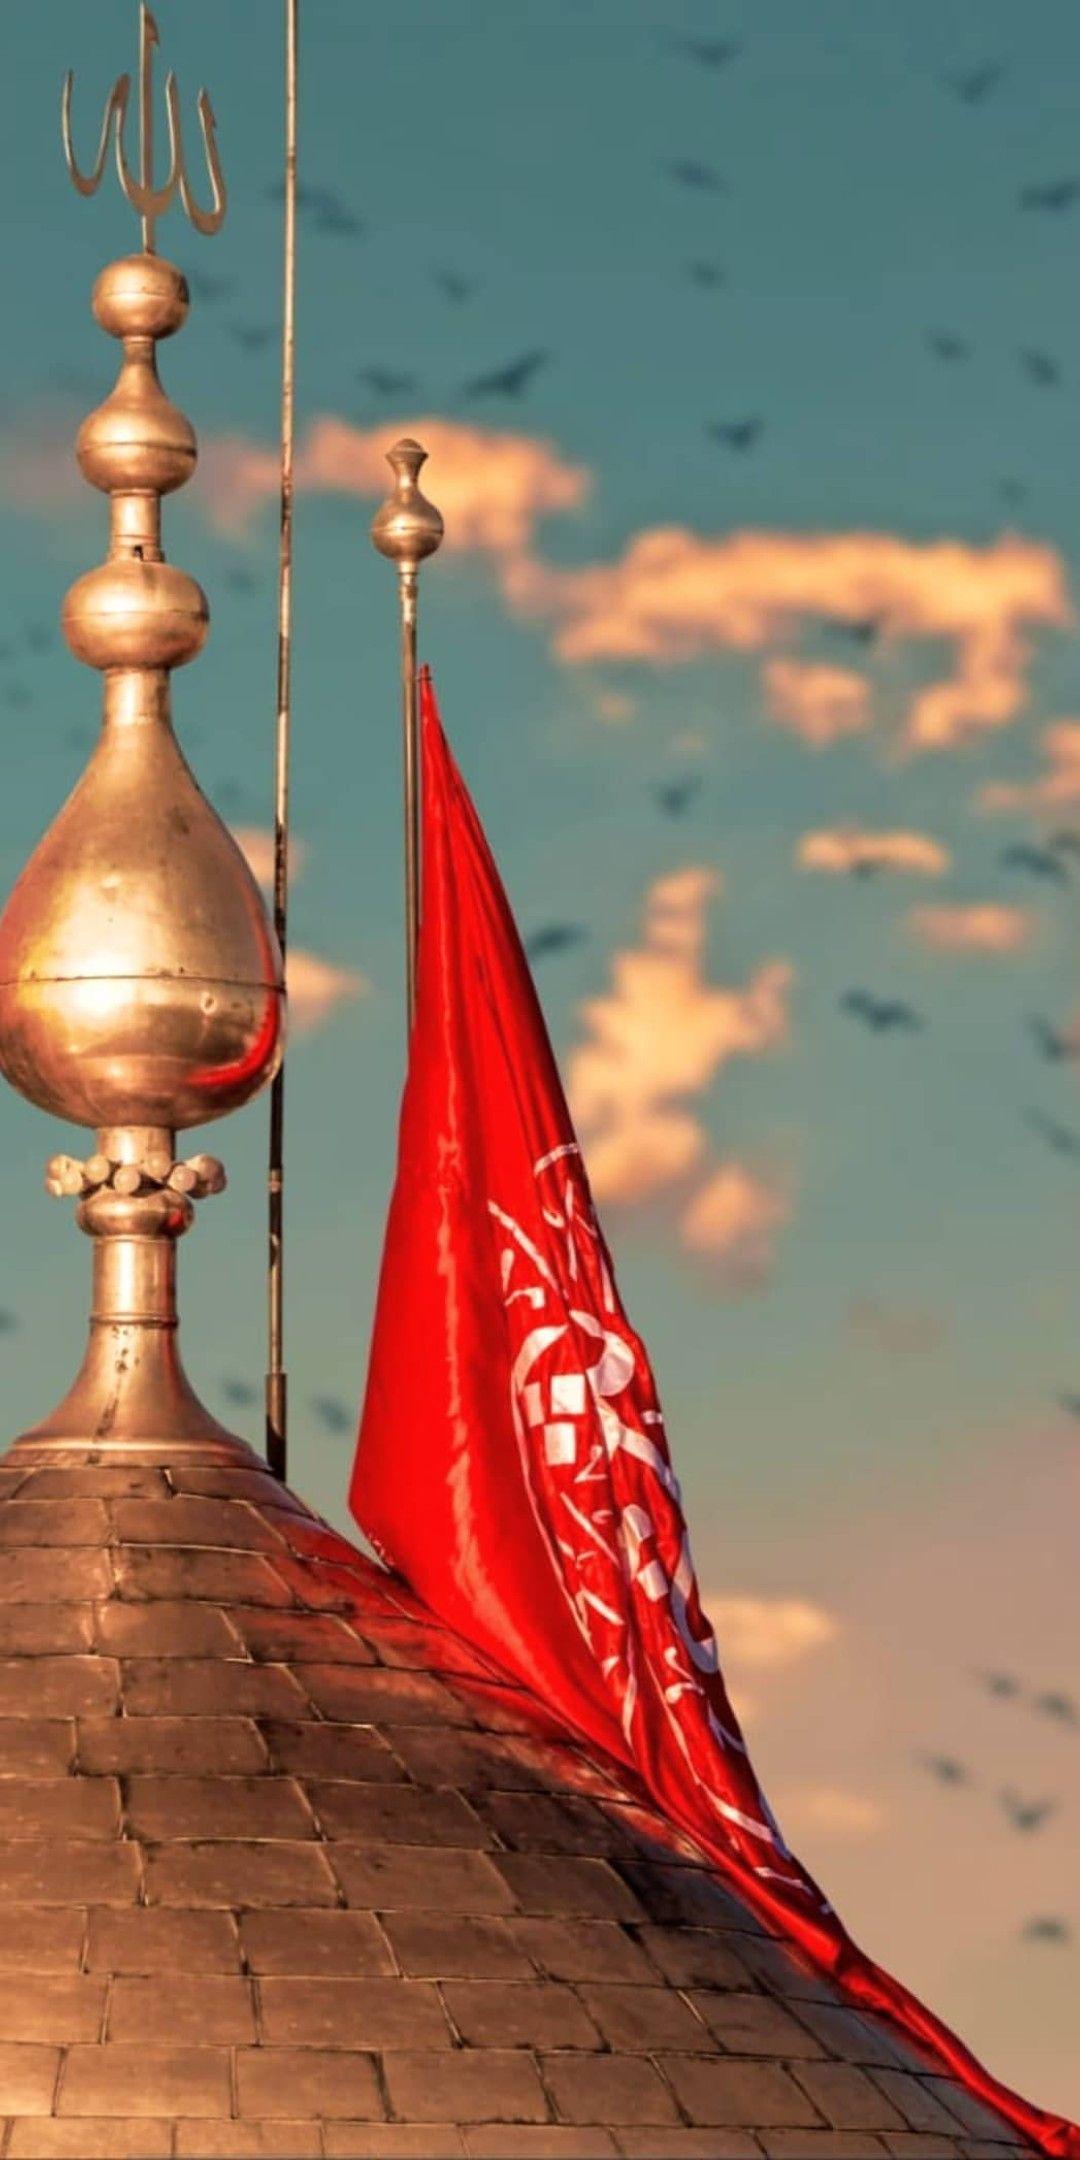 Abalfazlalabbas Alabbas Karbala Iraq Muharram Muharram1440 Imam Hussain Wallpapers Muharram Wallpaper Hazrat Imam Hussain